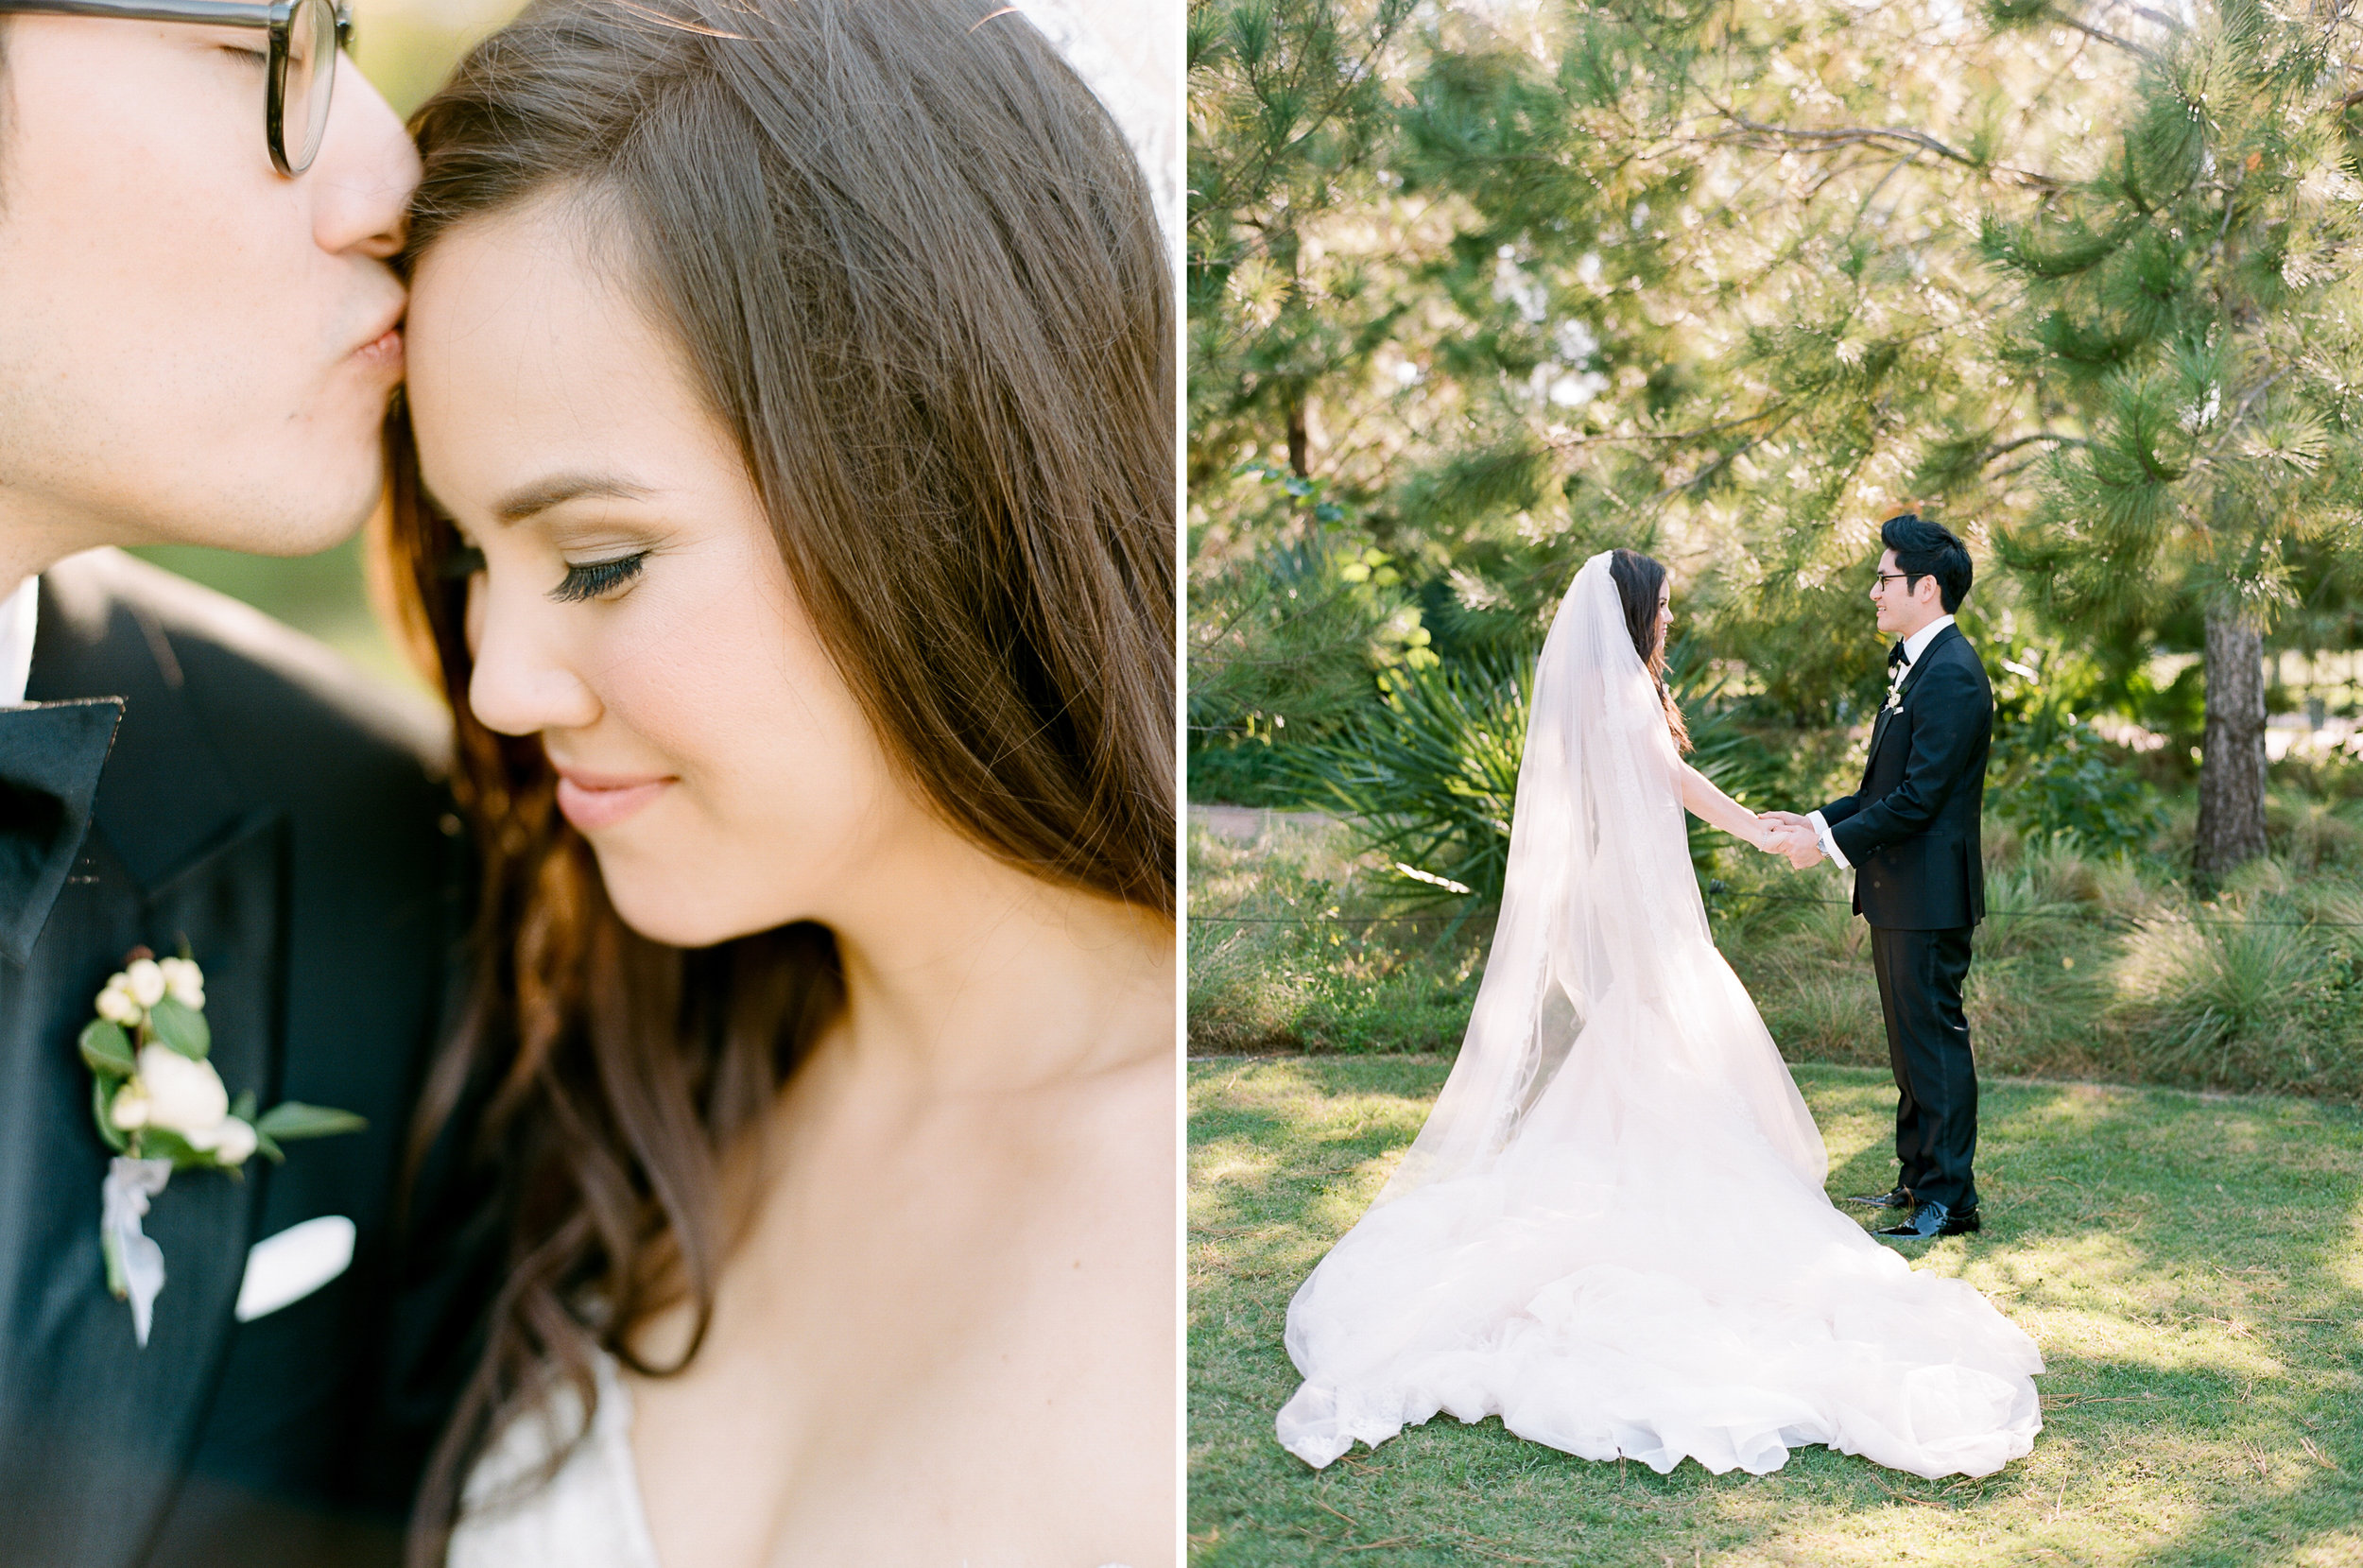 Martha-Stewart-Wedding-Dana-Fernandez-Photography-Josh-Texas-Film-Houston-Wedding-Fine-Art-Photographer-McGovern-Centennial-Gardens-Top-Best-302.jpg